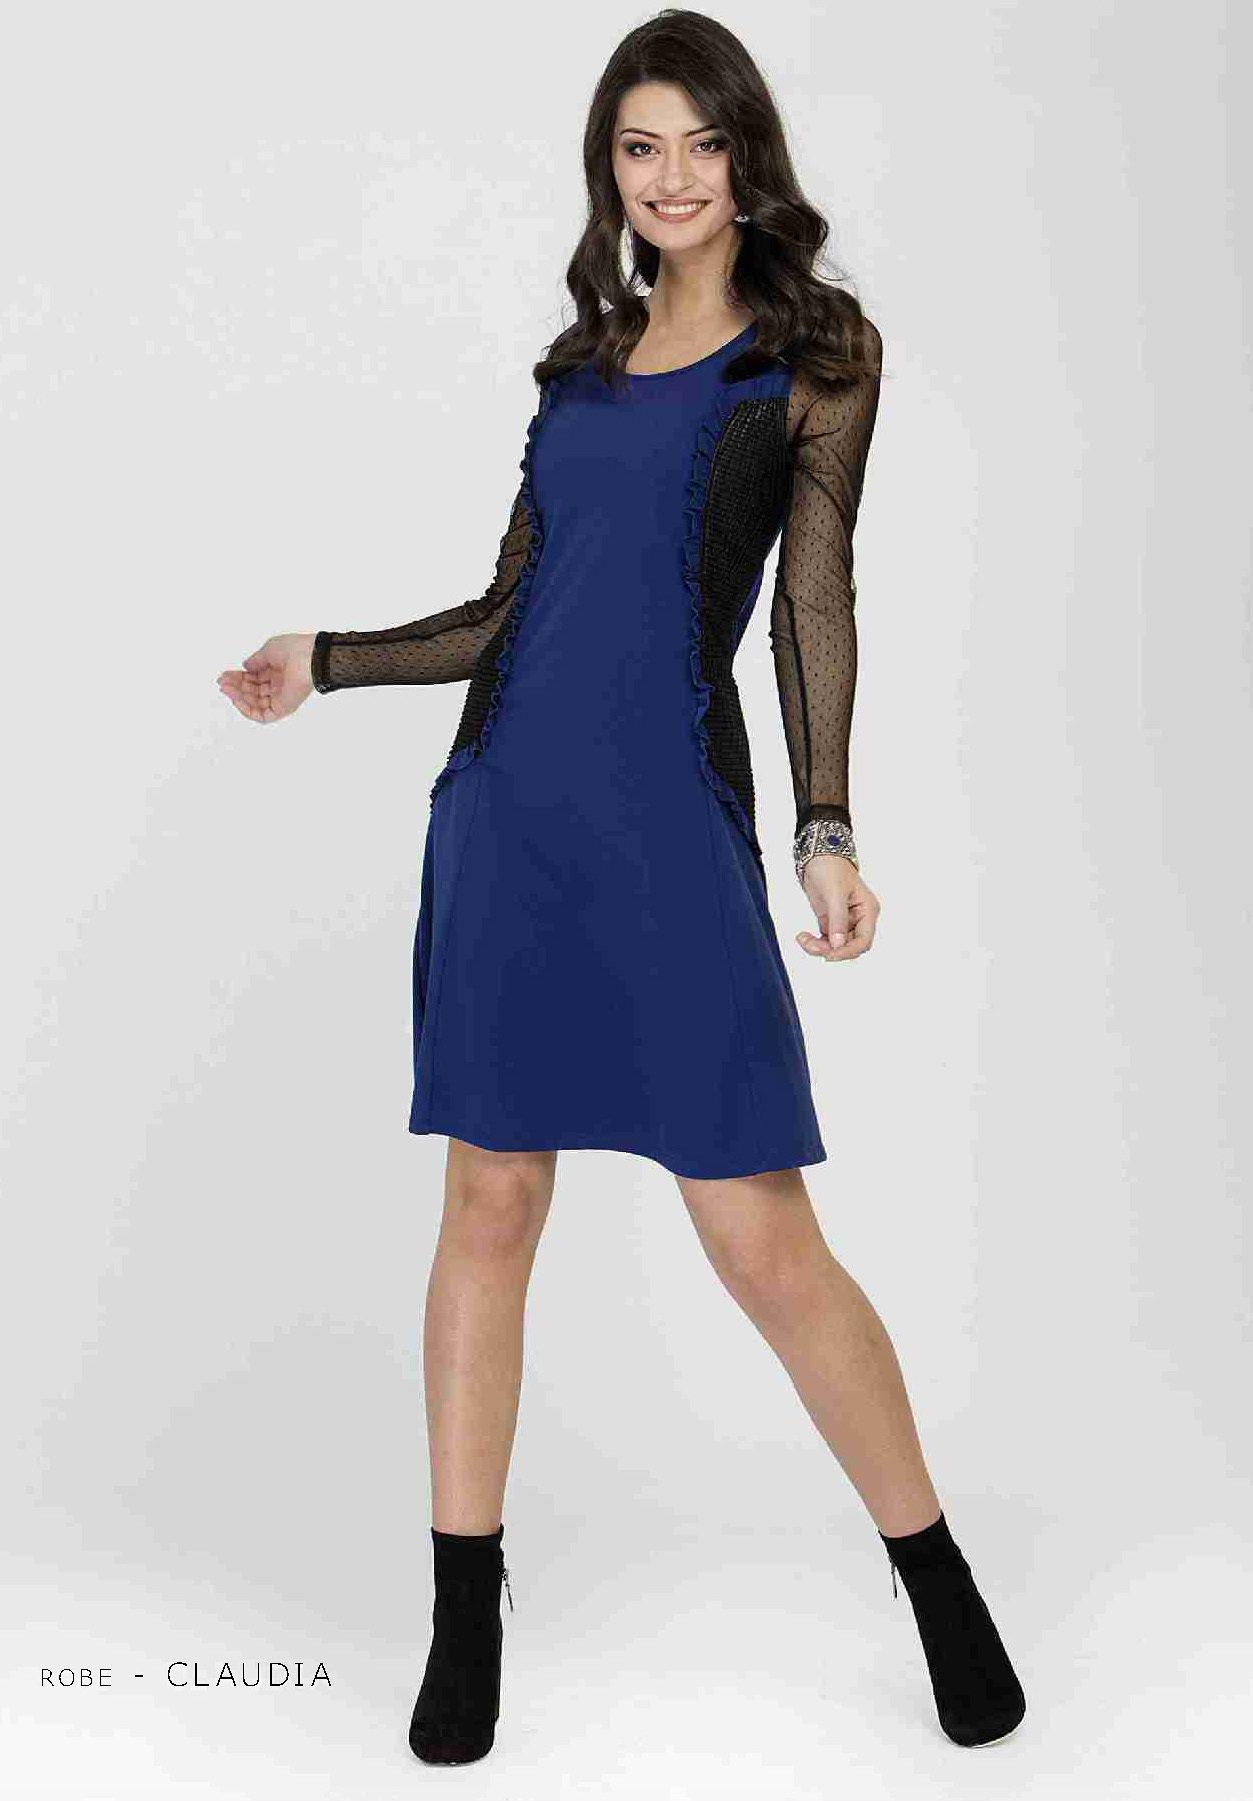 Maloka: Side Ruffled & Laced Midi Nylon Dress (1 Left!) MK_CLAUDIA_N1